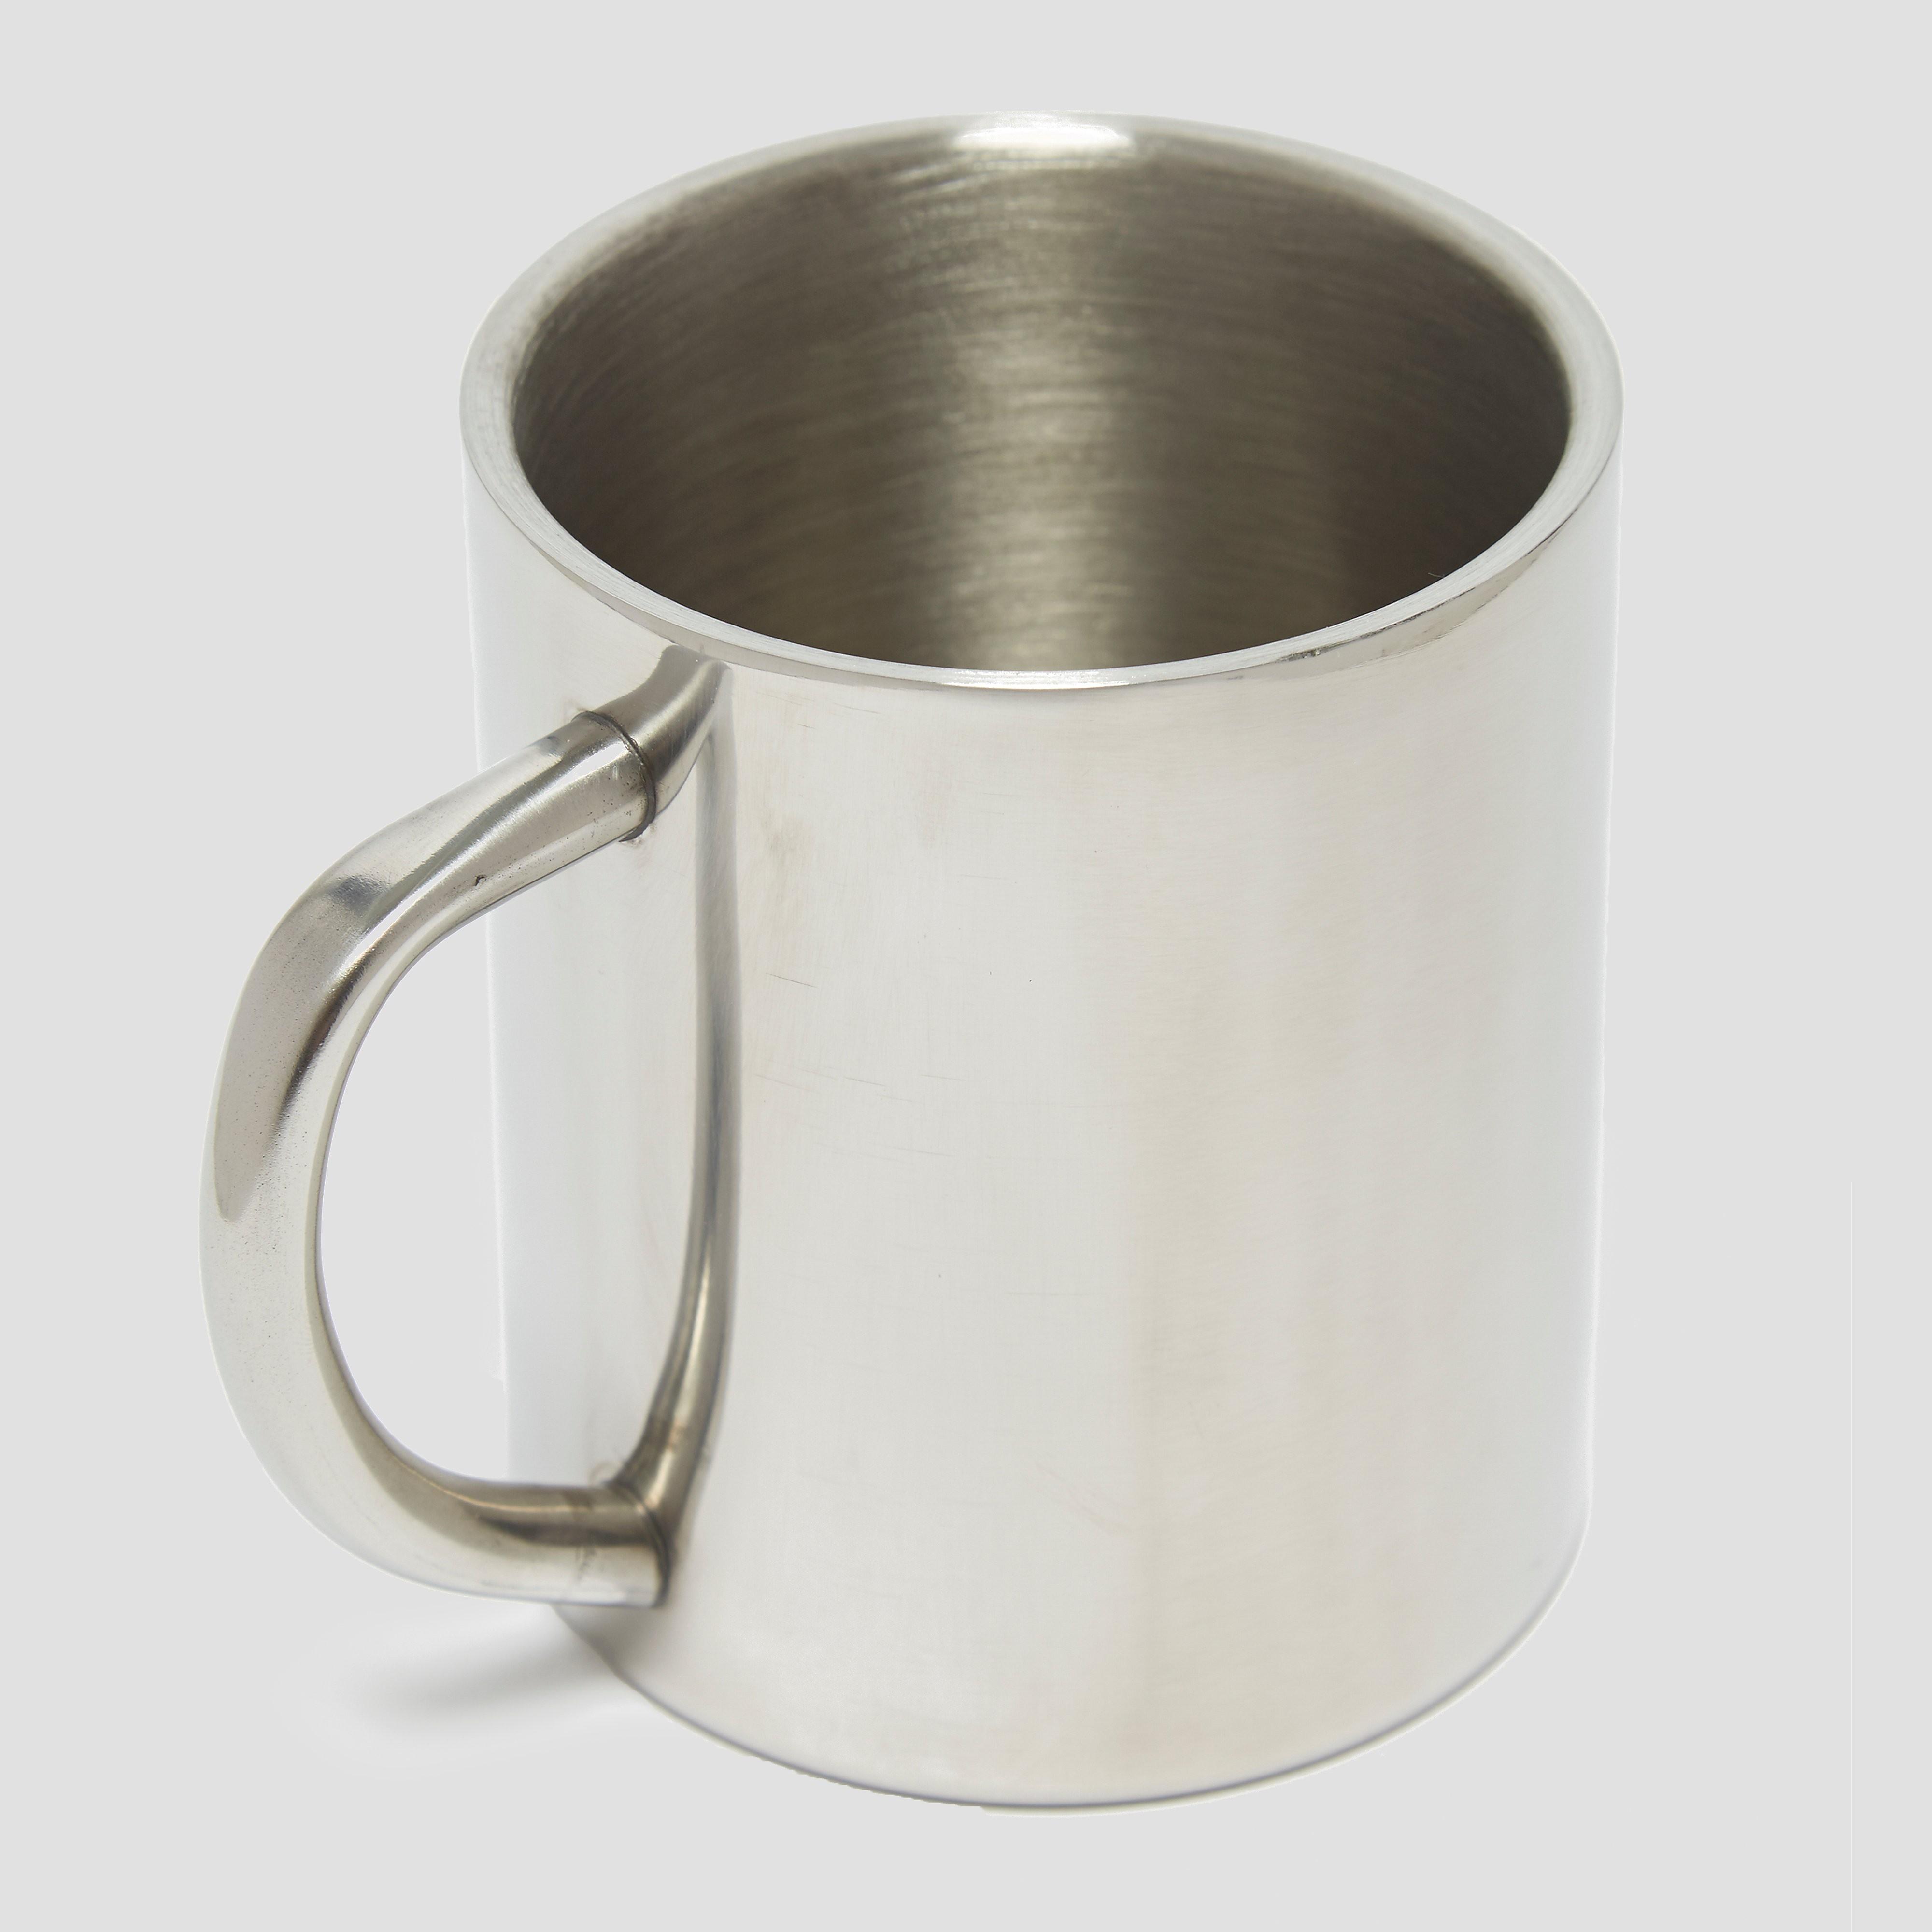 LIFEVENTURE Stainless Steel Mug